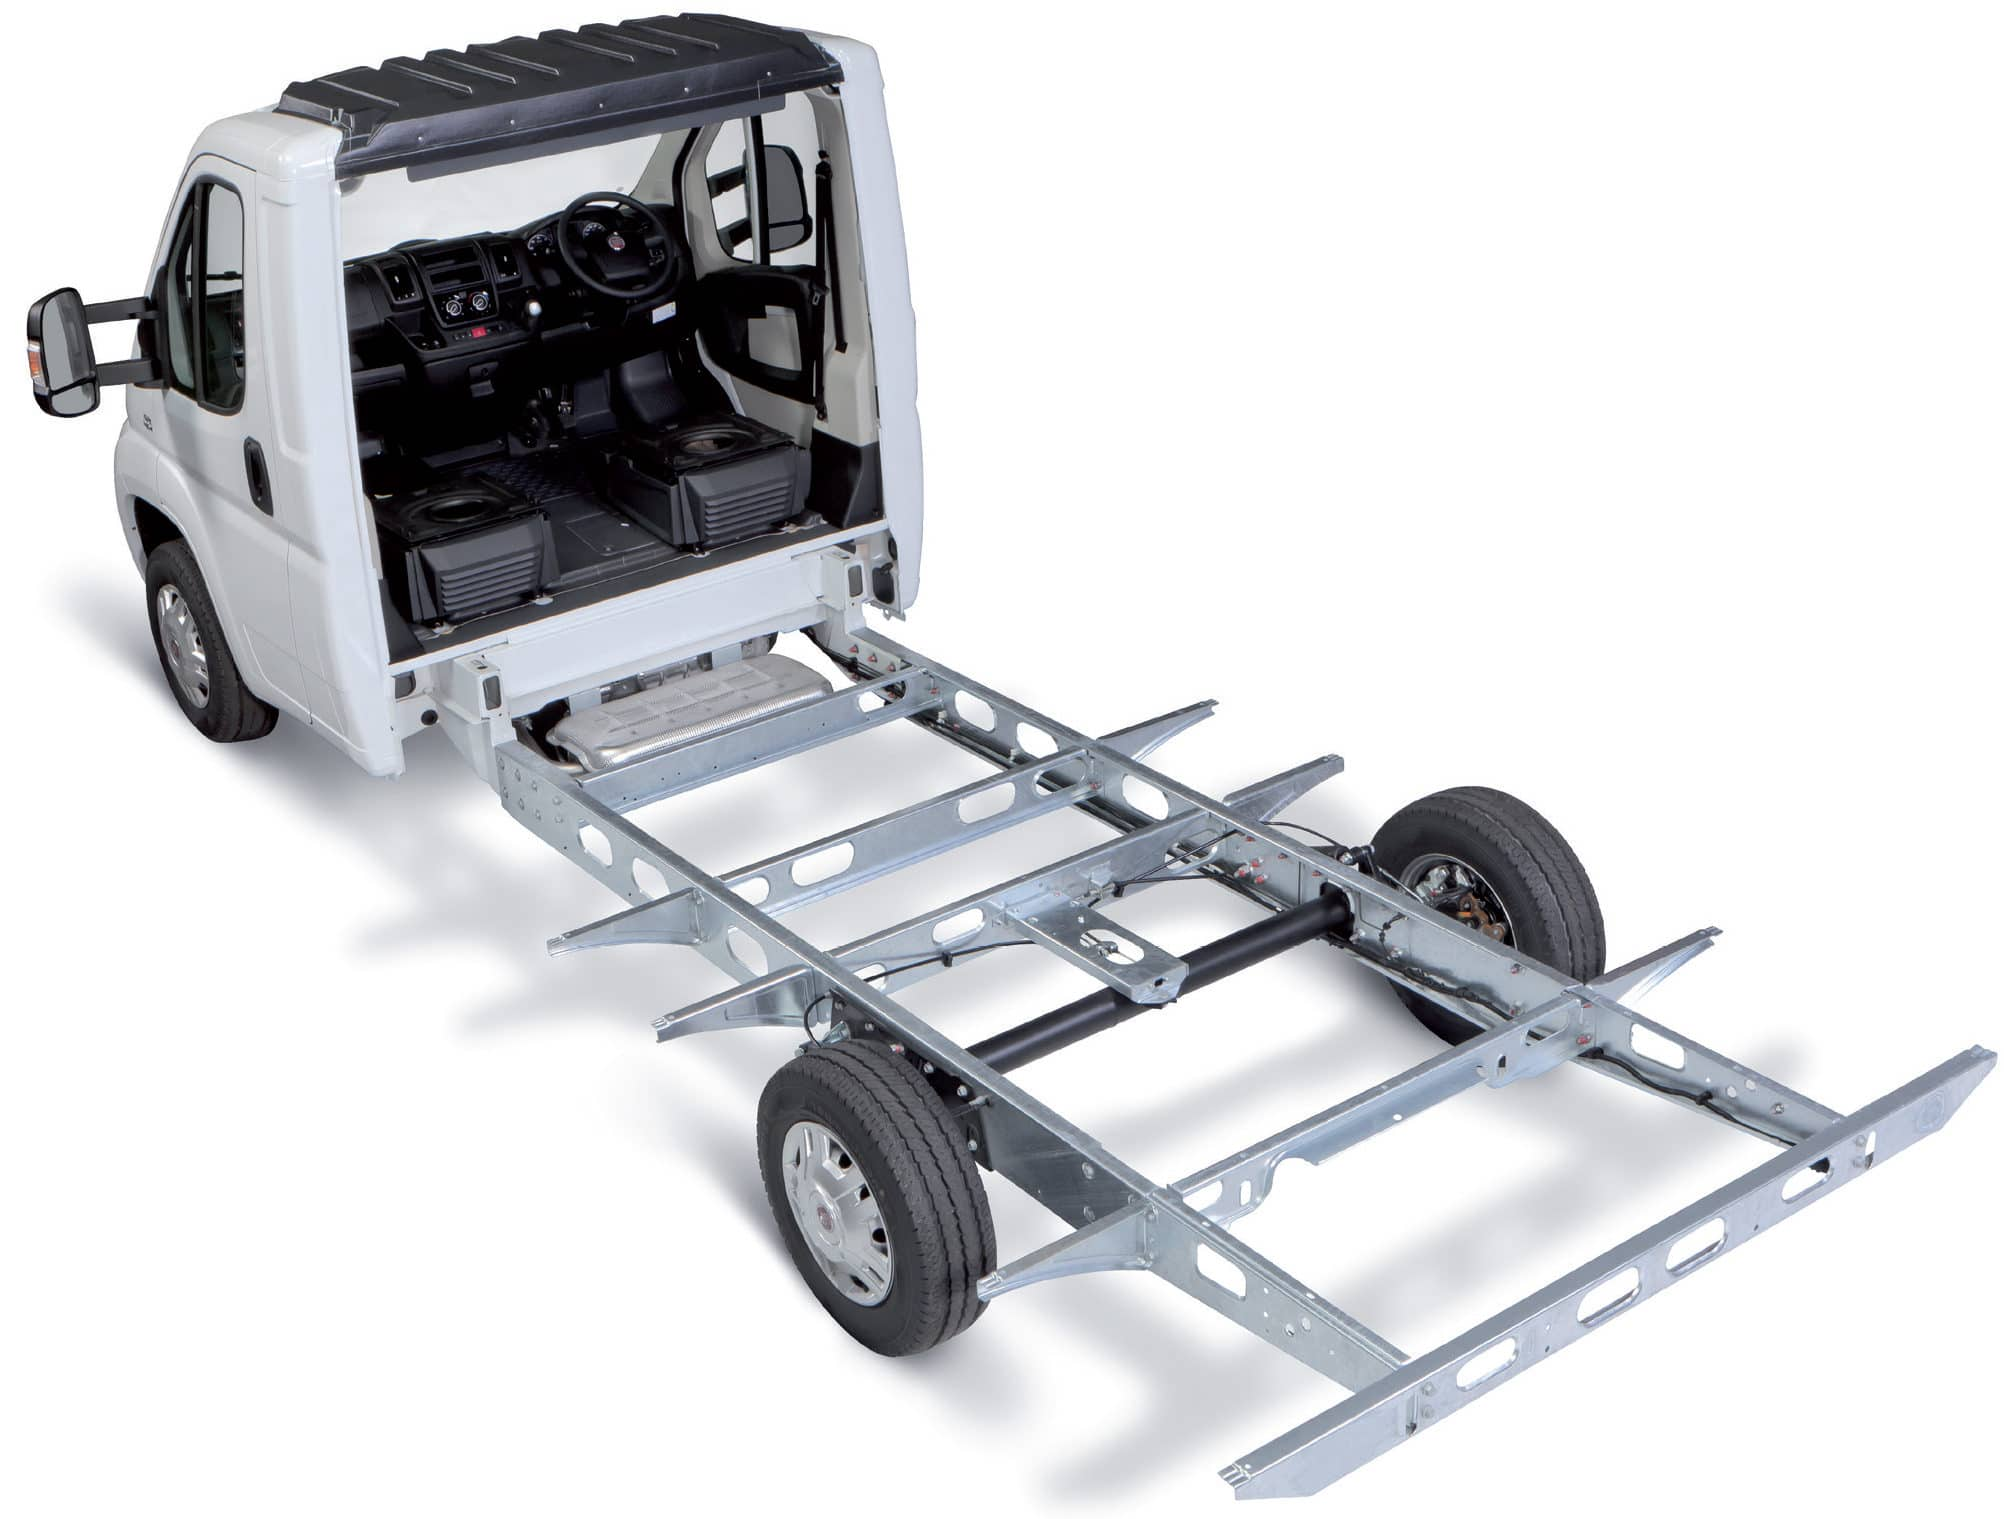 AL-KO chassis motorhome